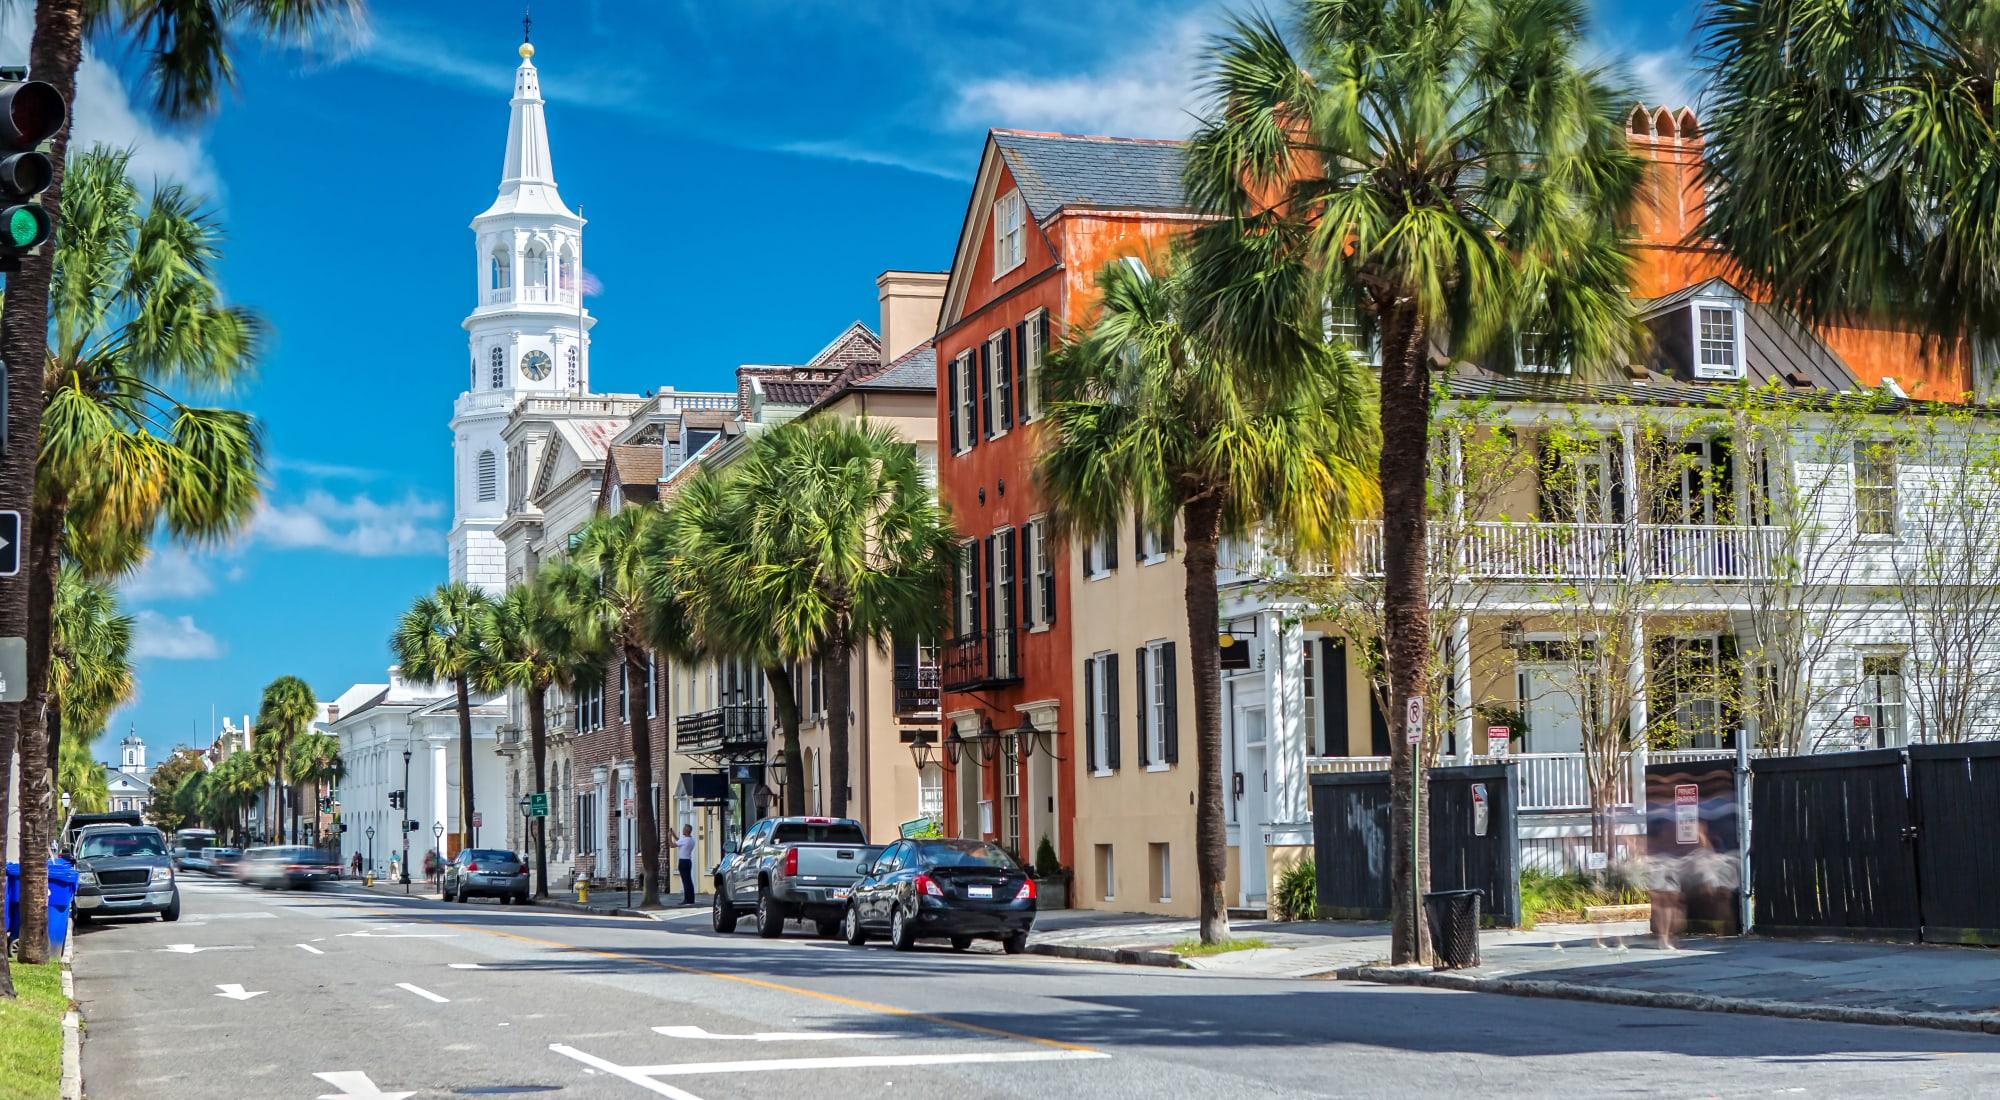 511 Meeting neighborhood in Charleston, South Carolina